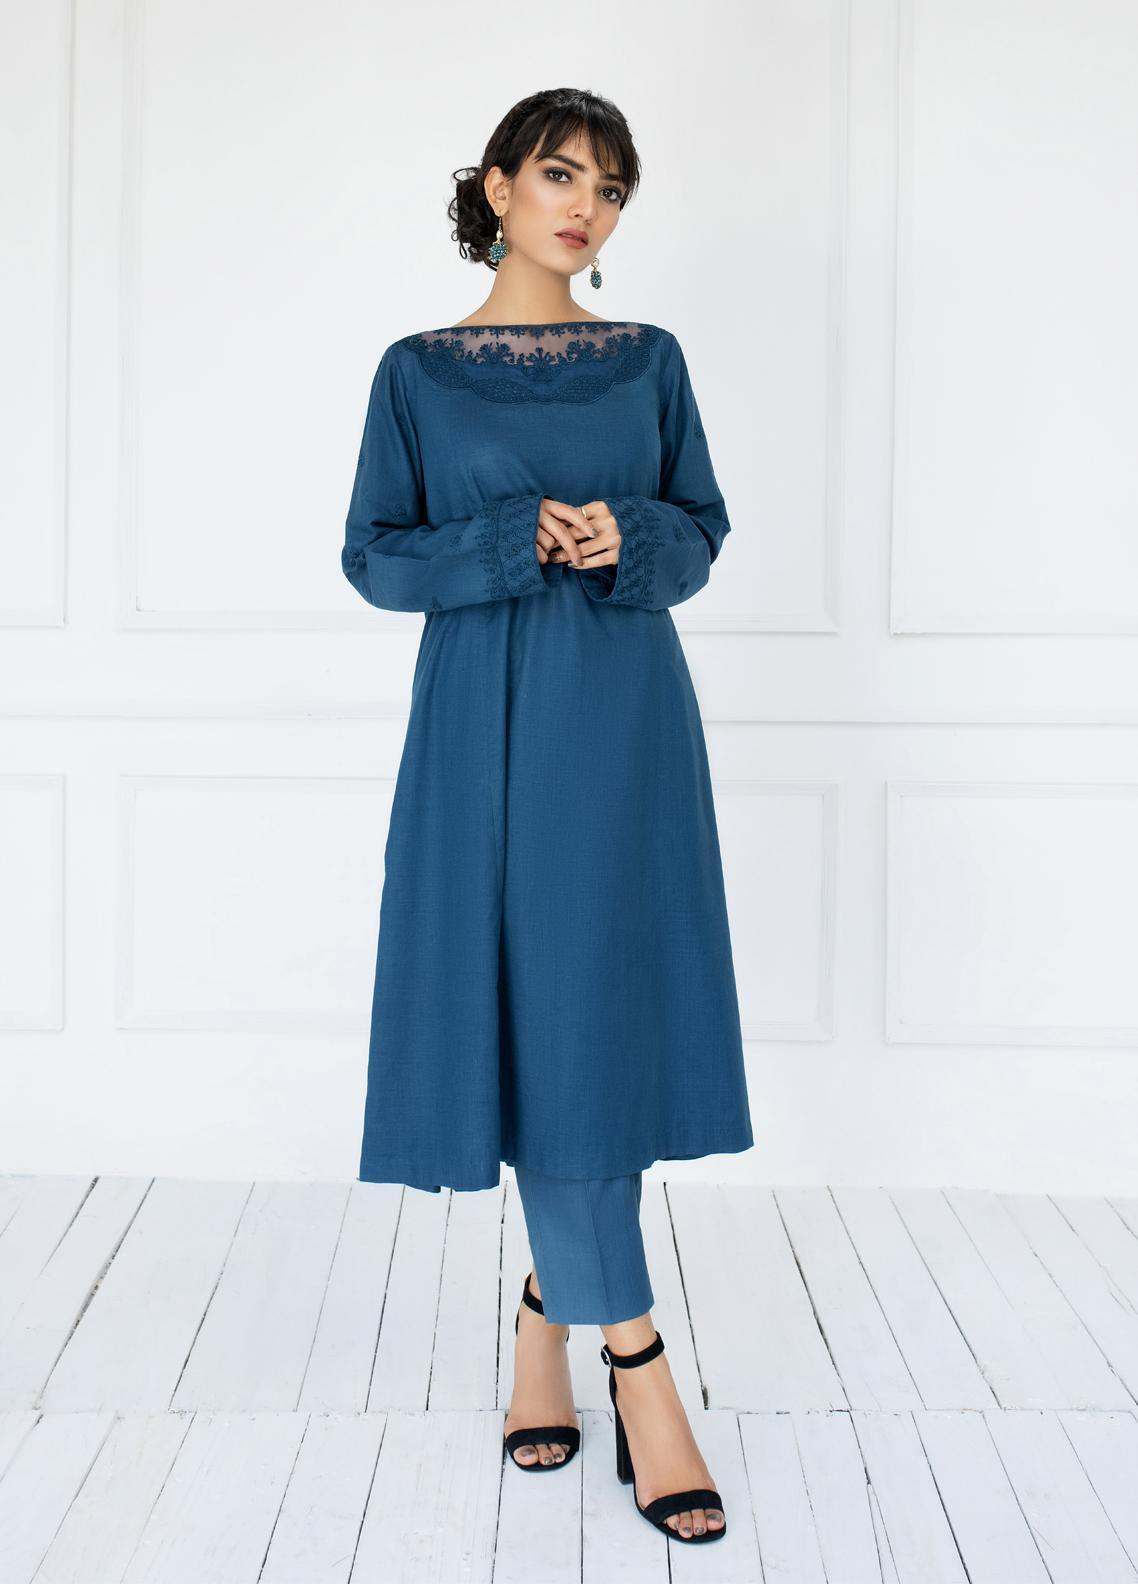 ILAHA Luxury Pret Embroidered Lawn 2 Piece Suit AZURE ALLURE